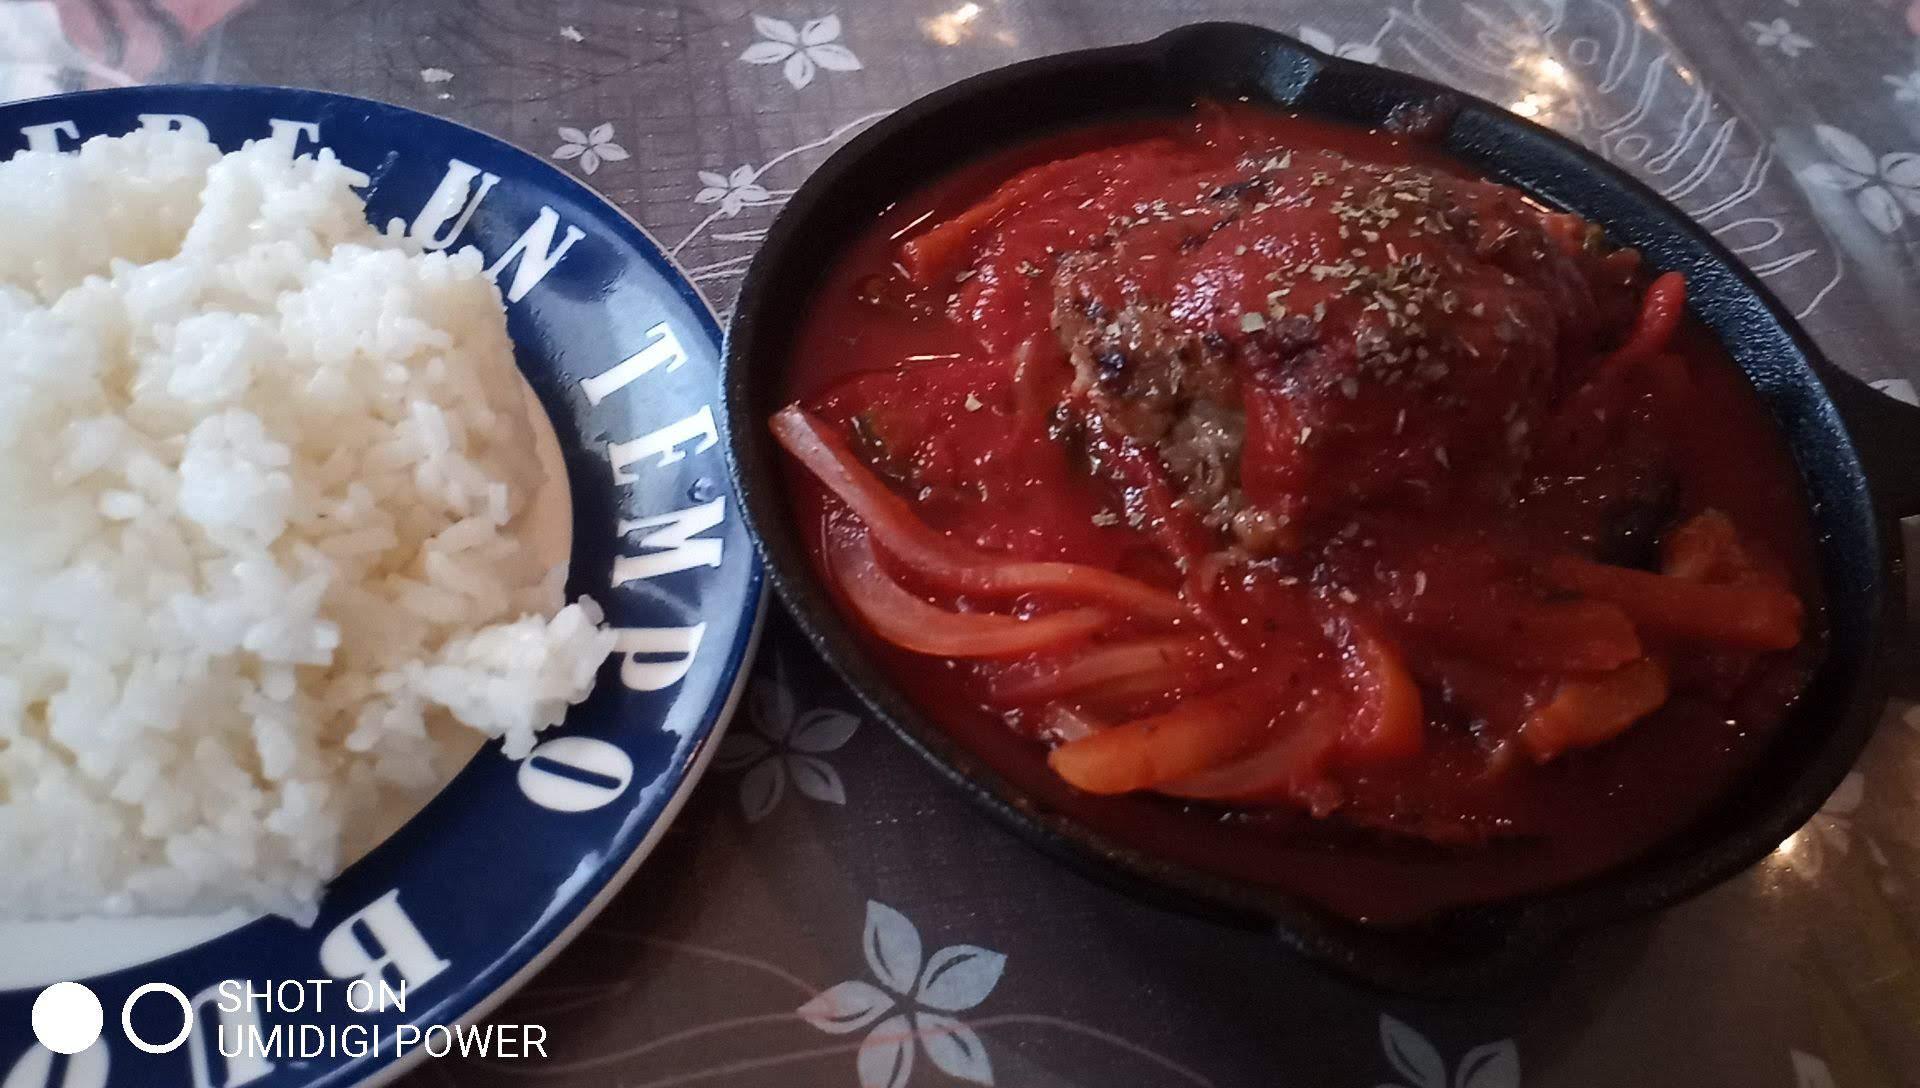 Hamburg and Tomato Pazza with Plenty of Vegetables